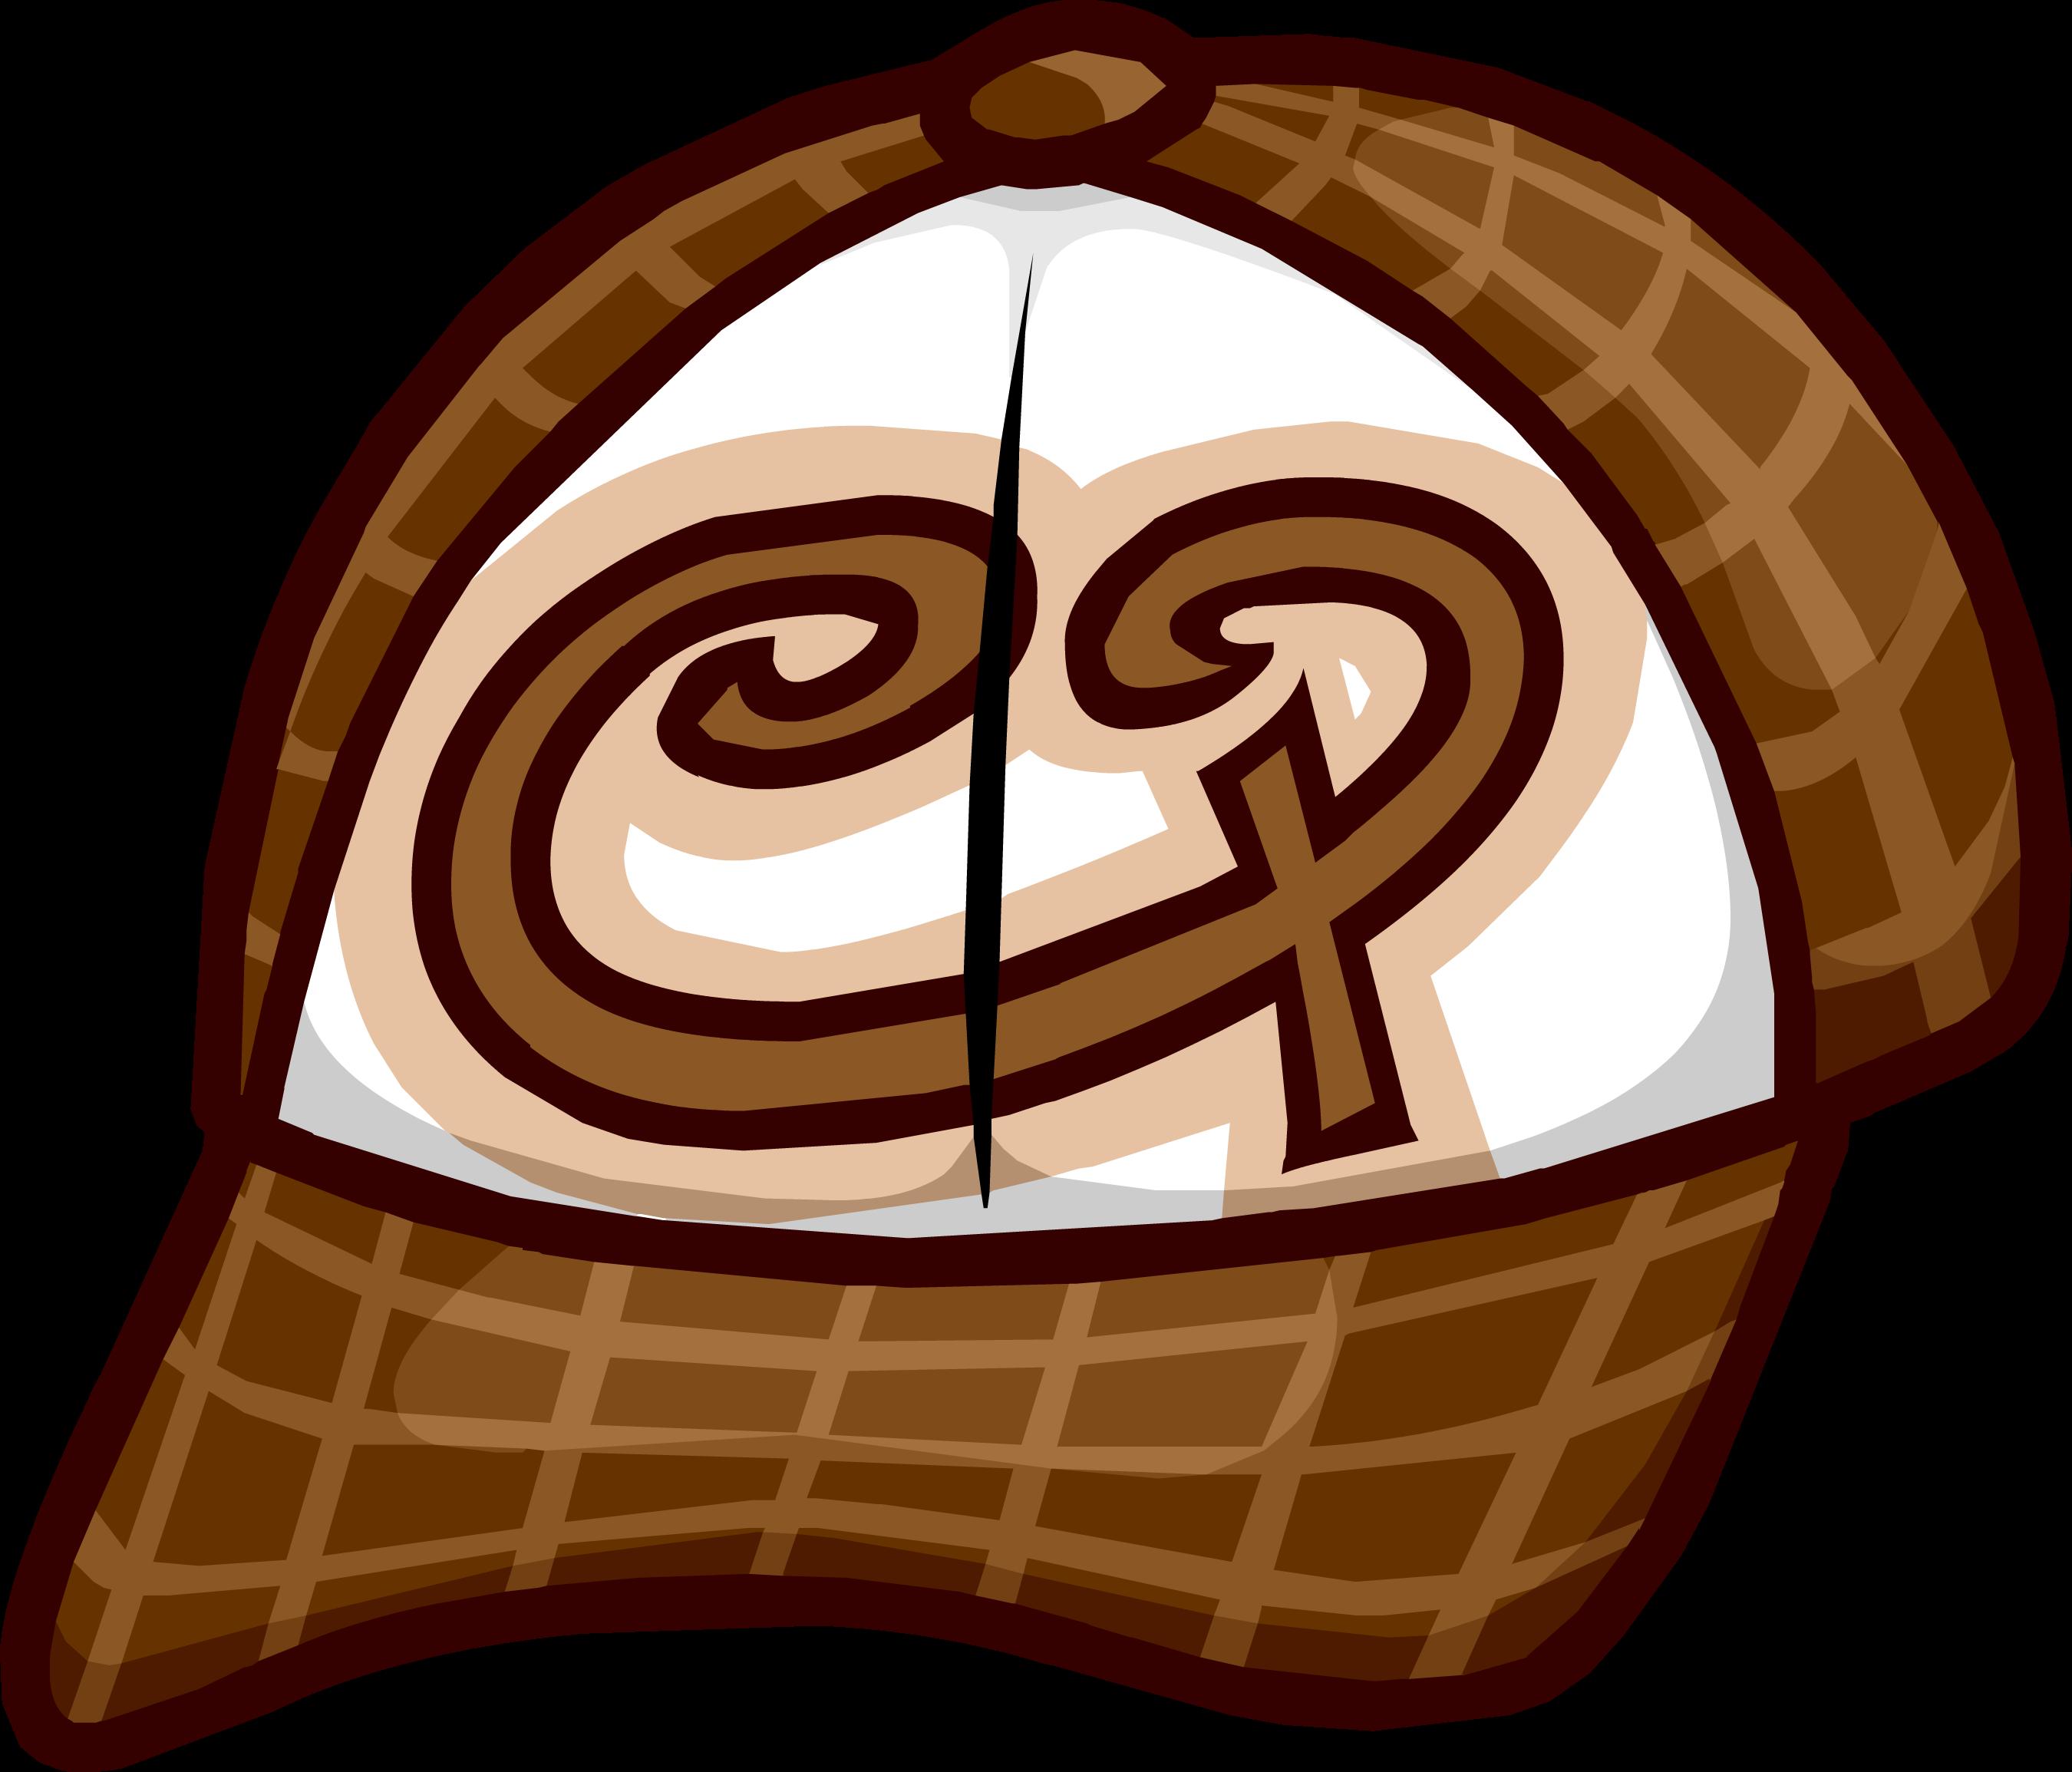 Gorrito de Skater Café